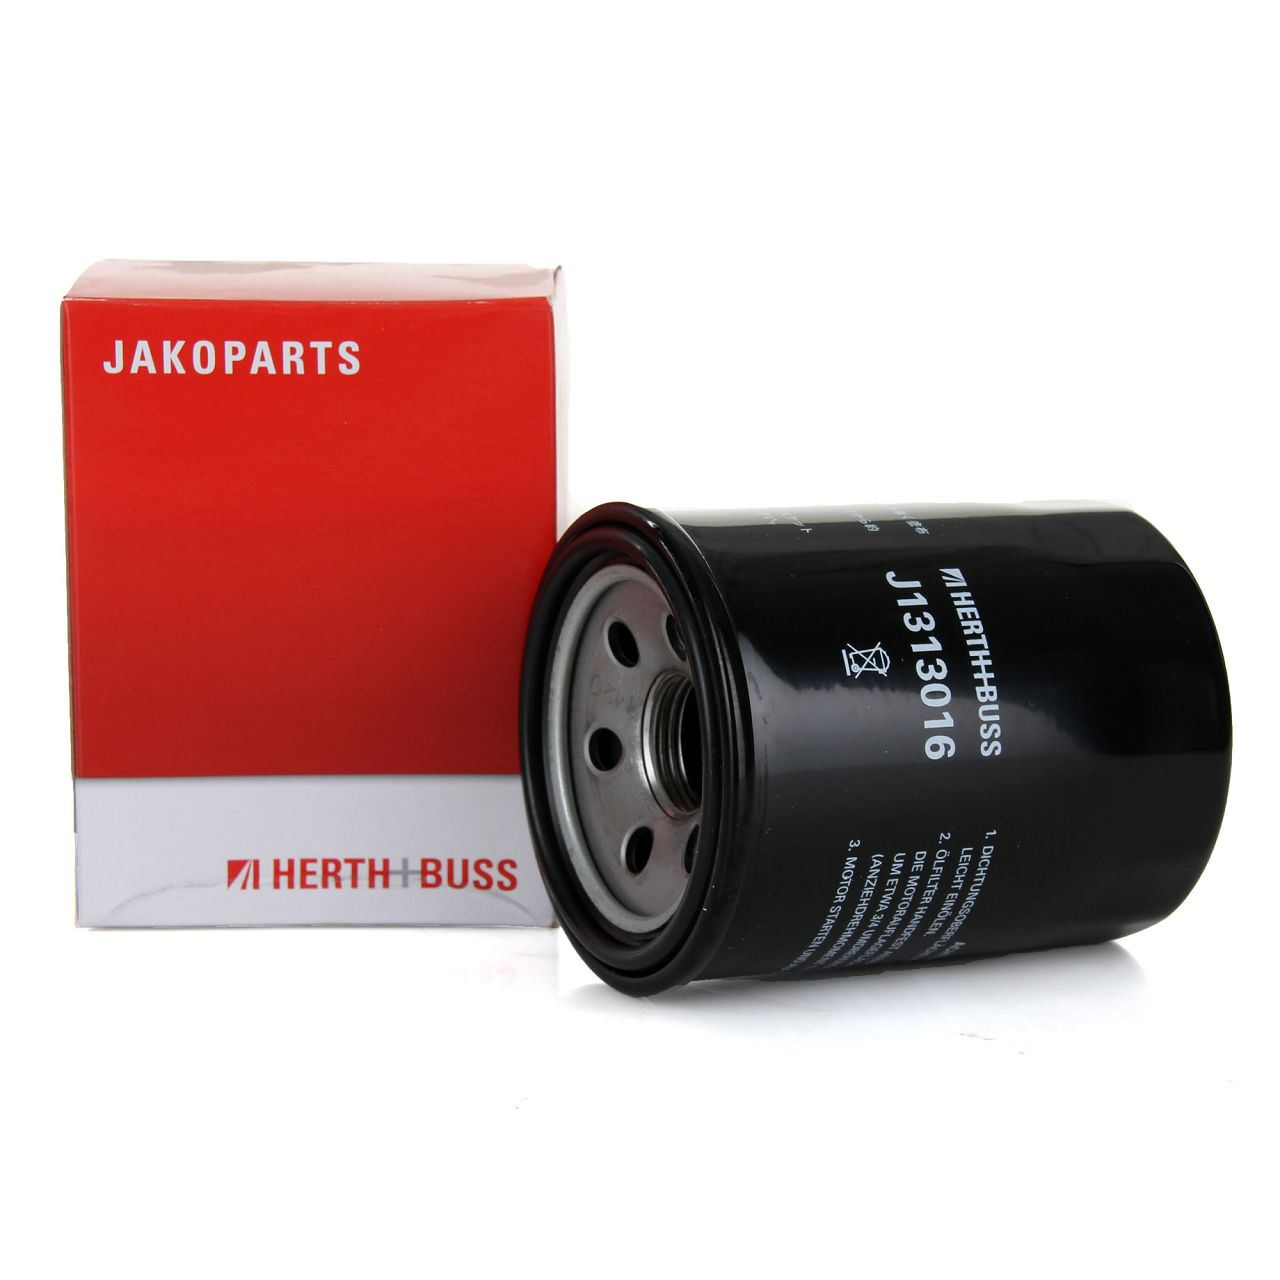 HERTH+BUSS JAKOPARTS Ölfilter J1313016 für ISUZU KIA MAZDA MITSUBISHI VW